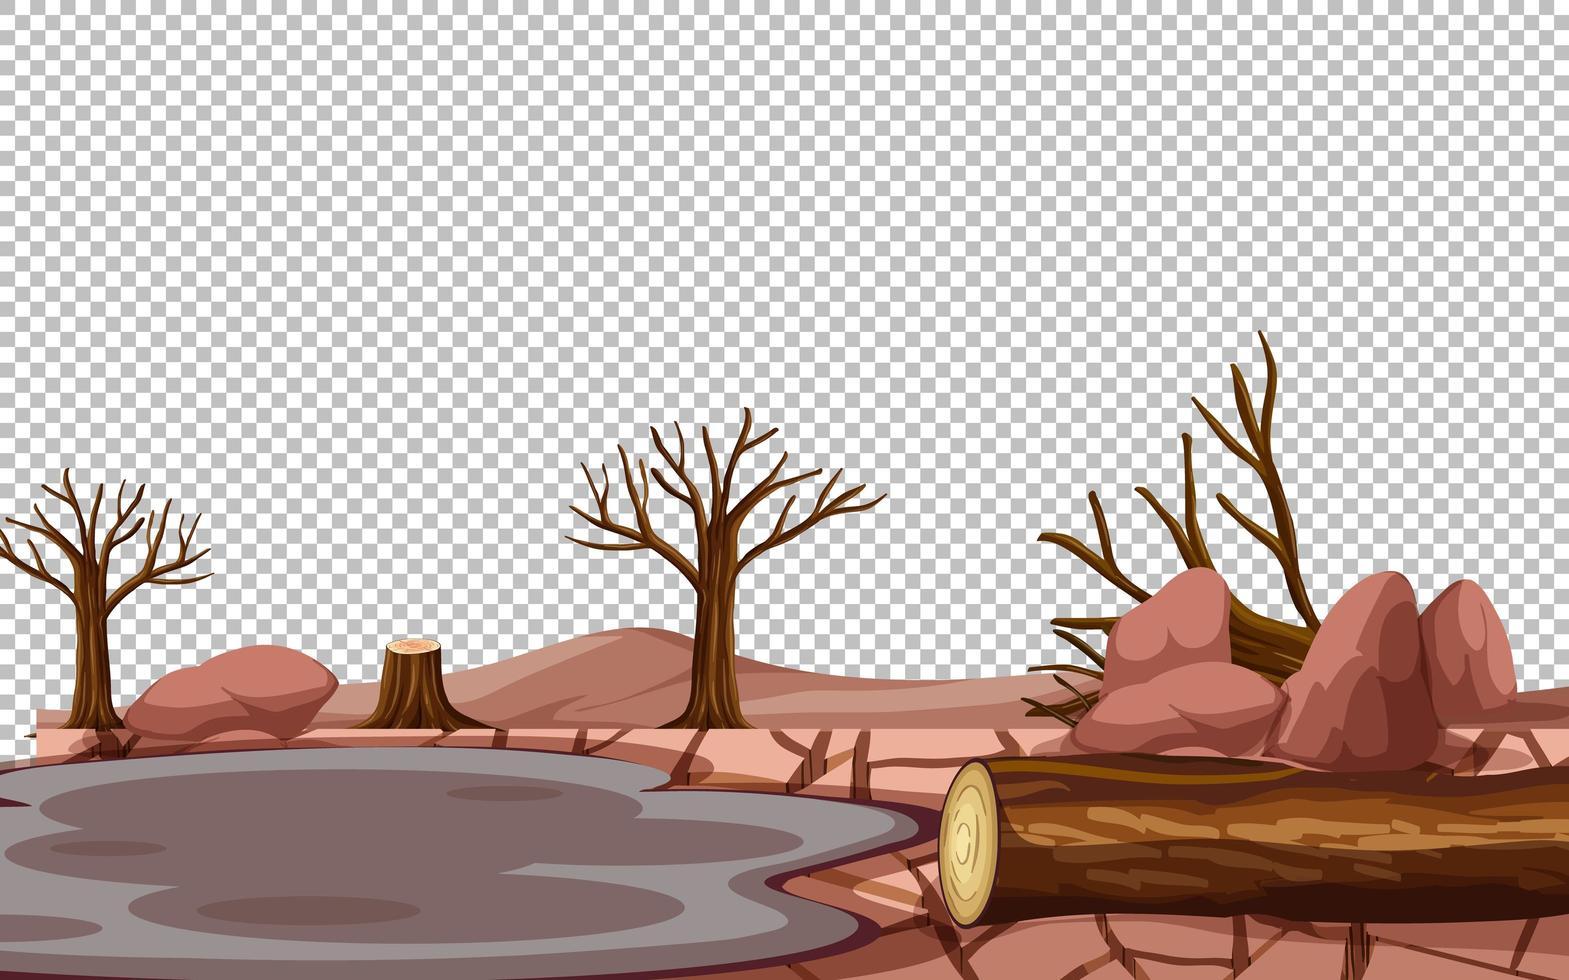 torka landskap transparent bakgrund vektor